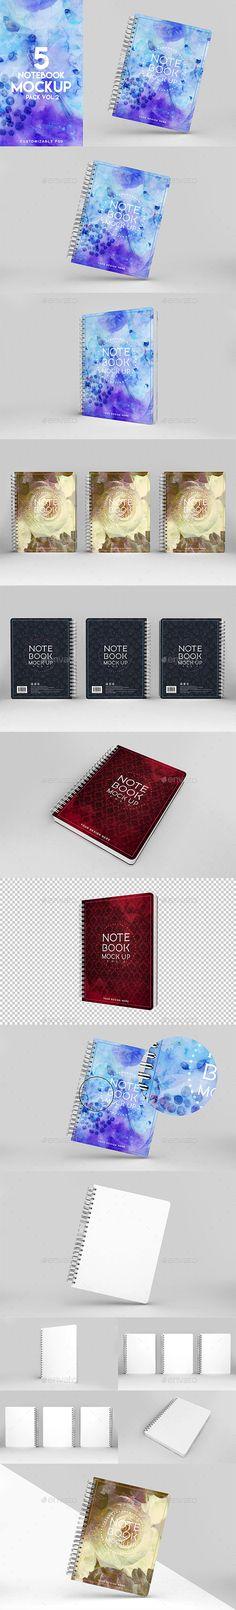 Notebook Mockup Vol 2 - Product Mock-Ups Graphics